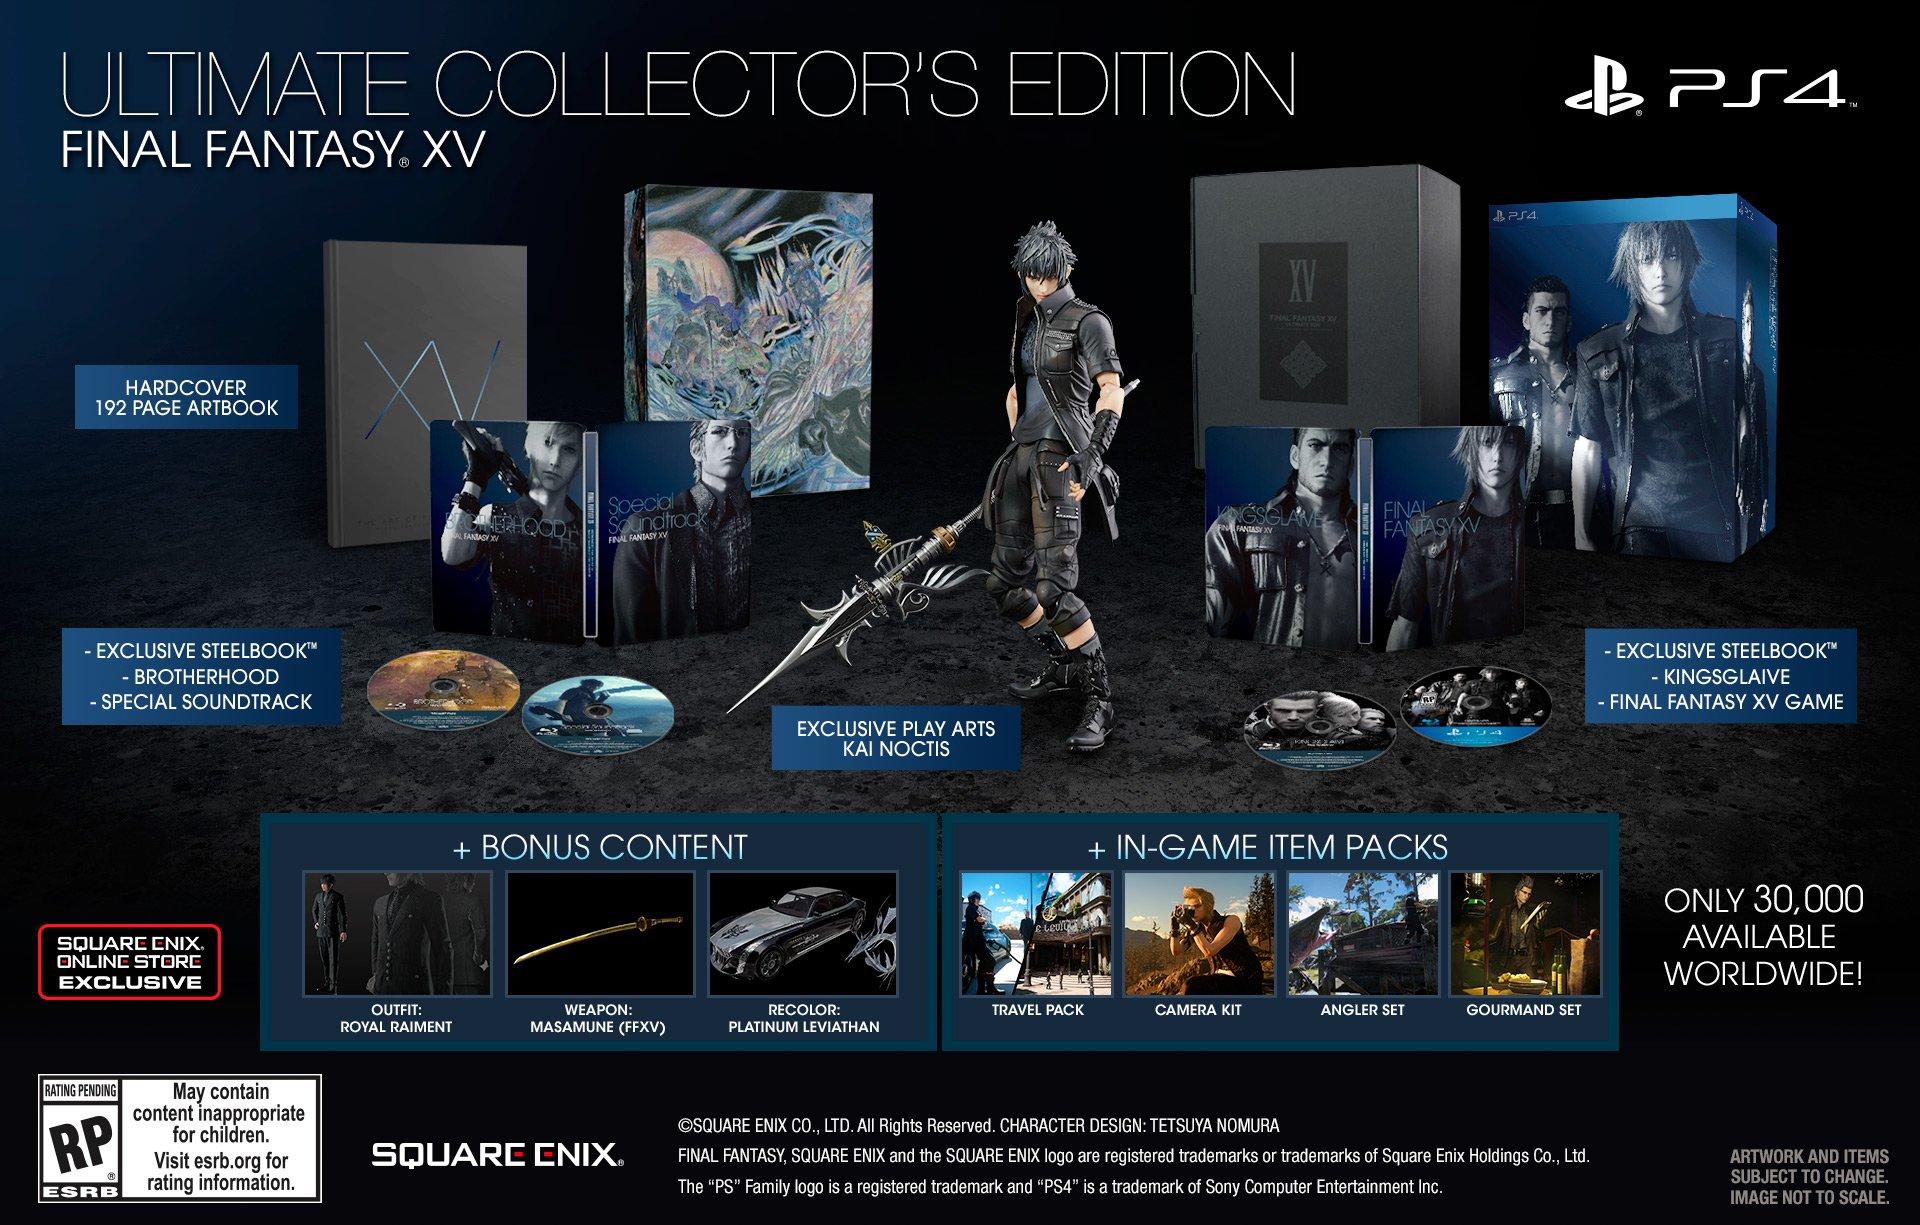 Final Fantasy XV Ultimate Edition